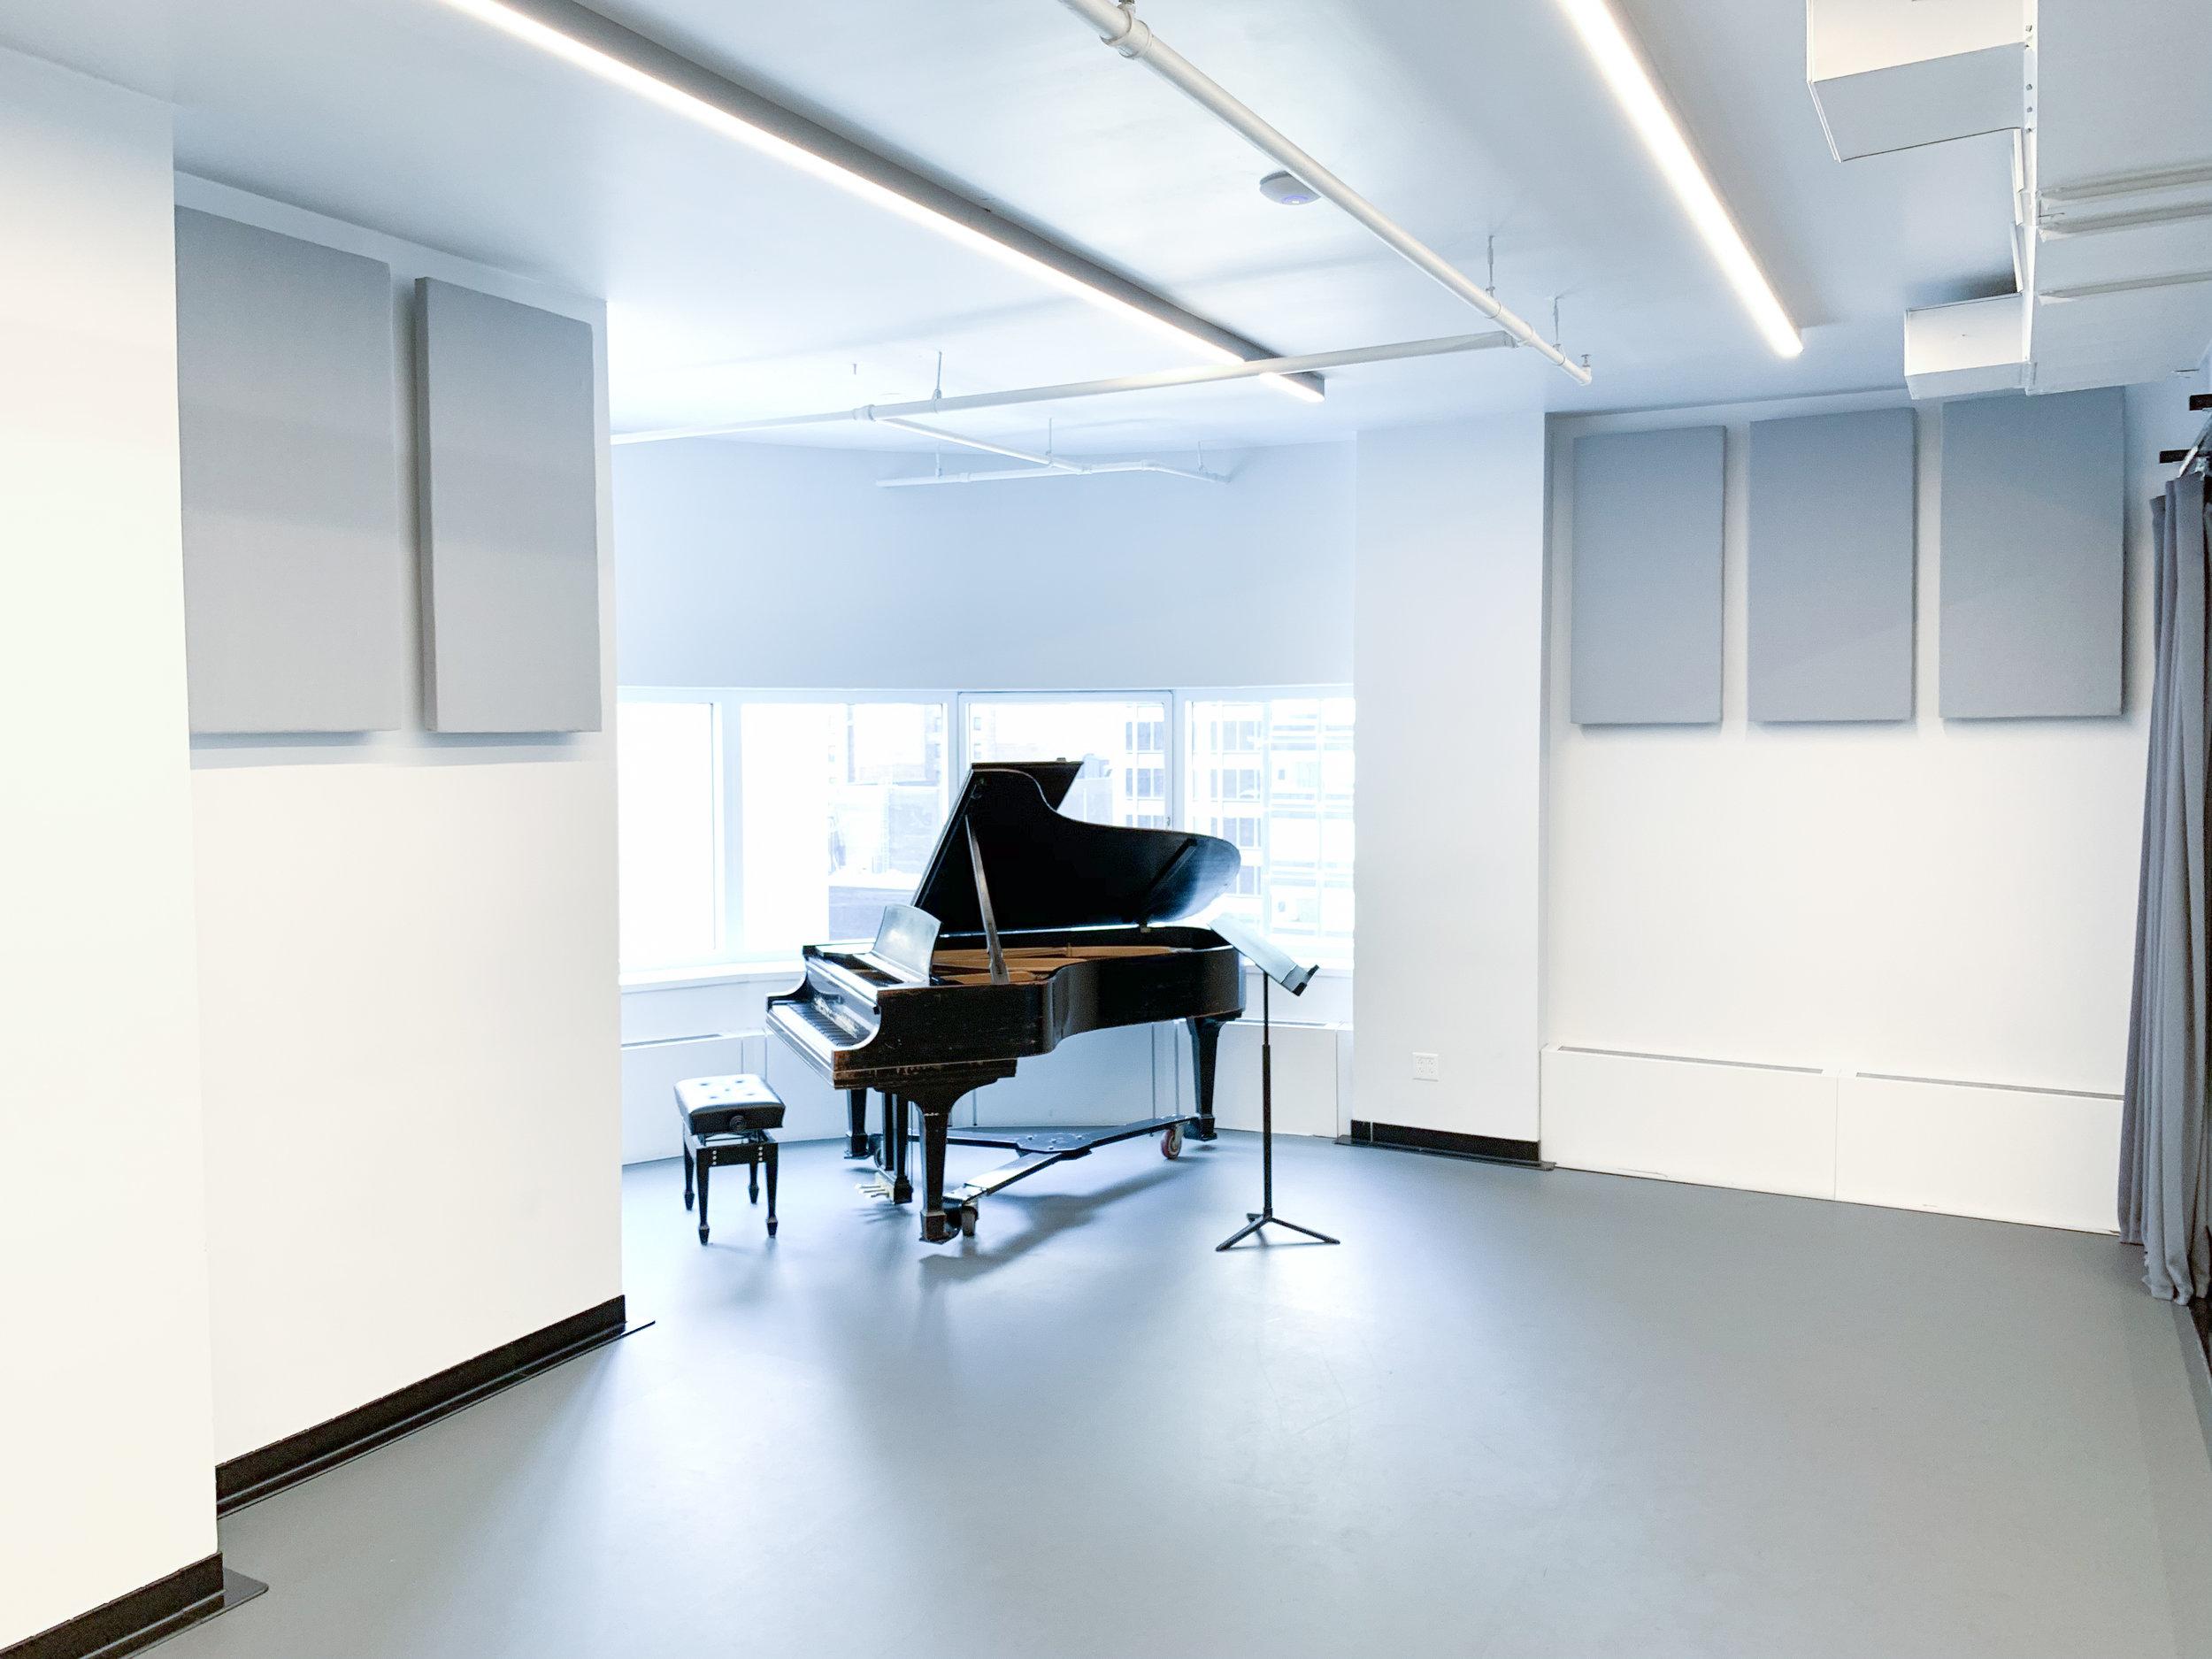 STUDIO 11M & 12M: (32' x 16')